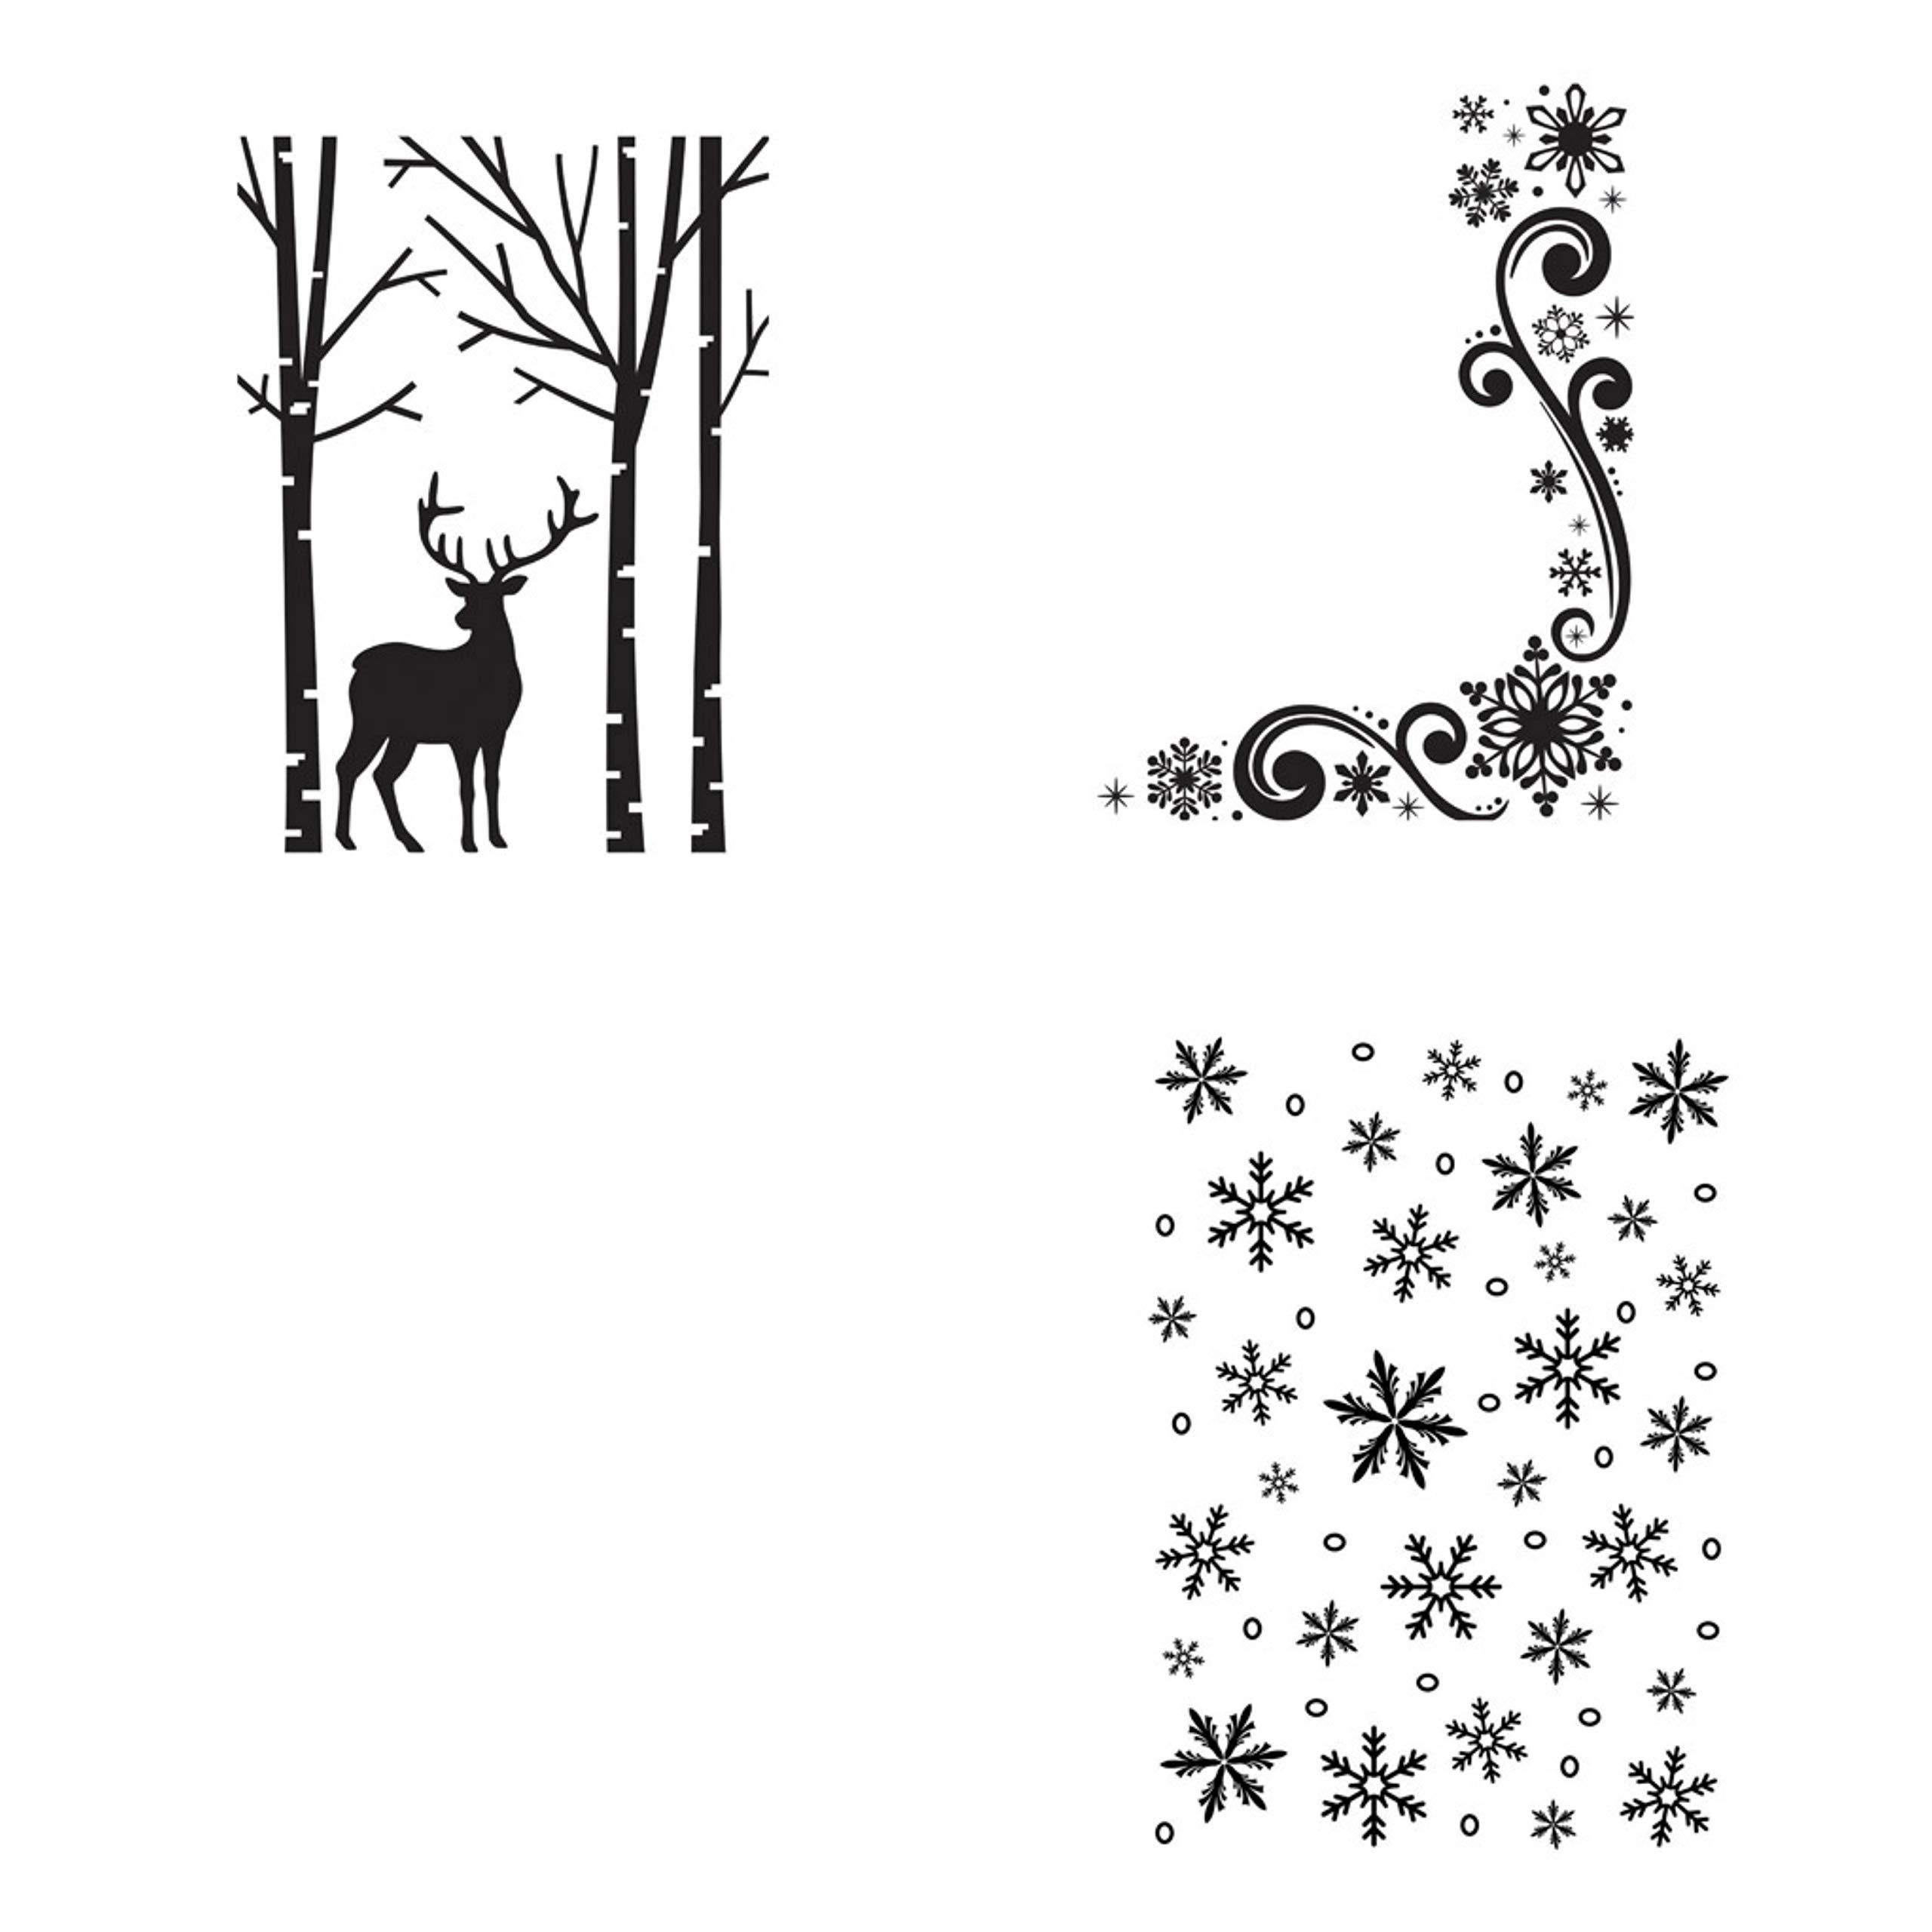 Darice Embossing Folders Winter Theme (Set of 3 Designs) by Darice